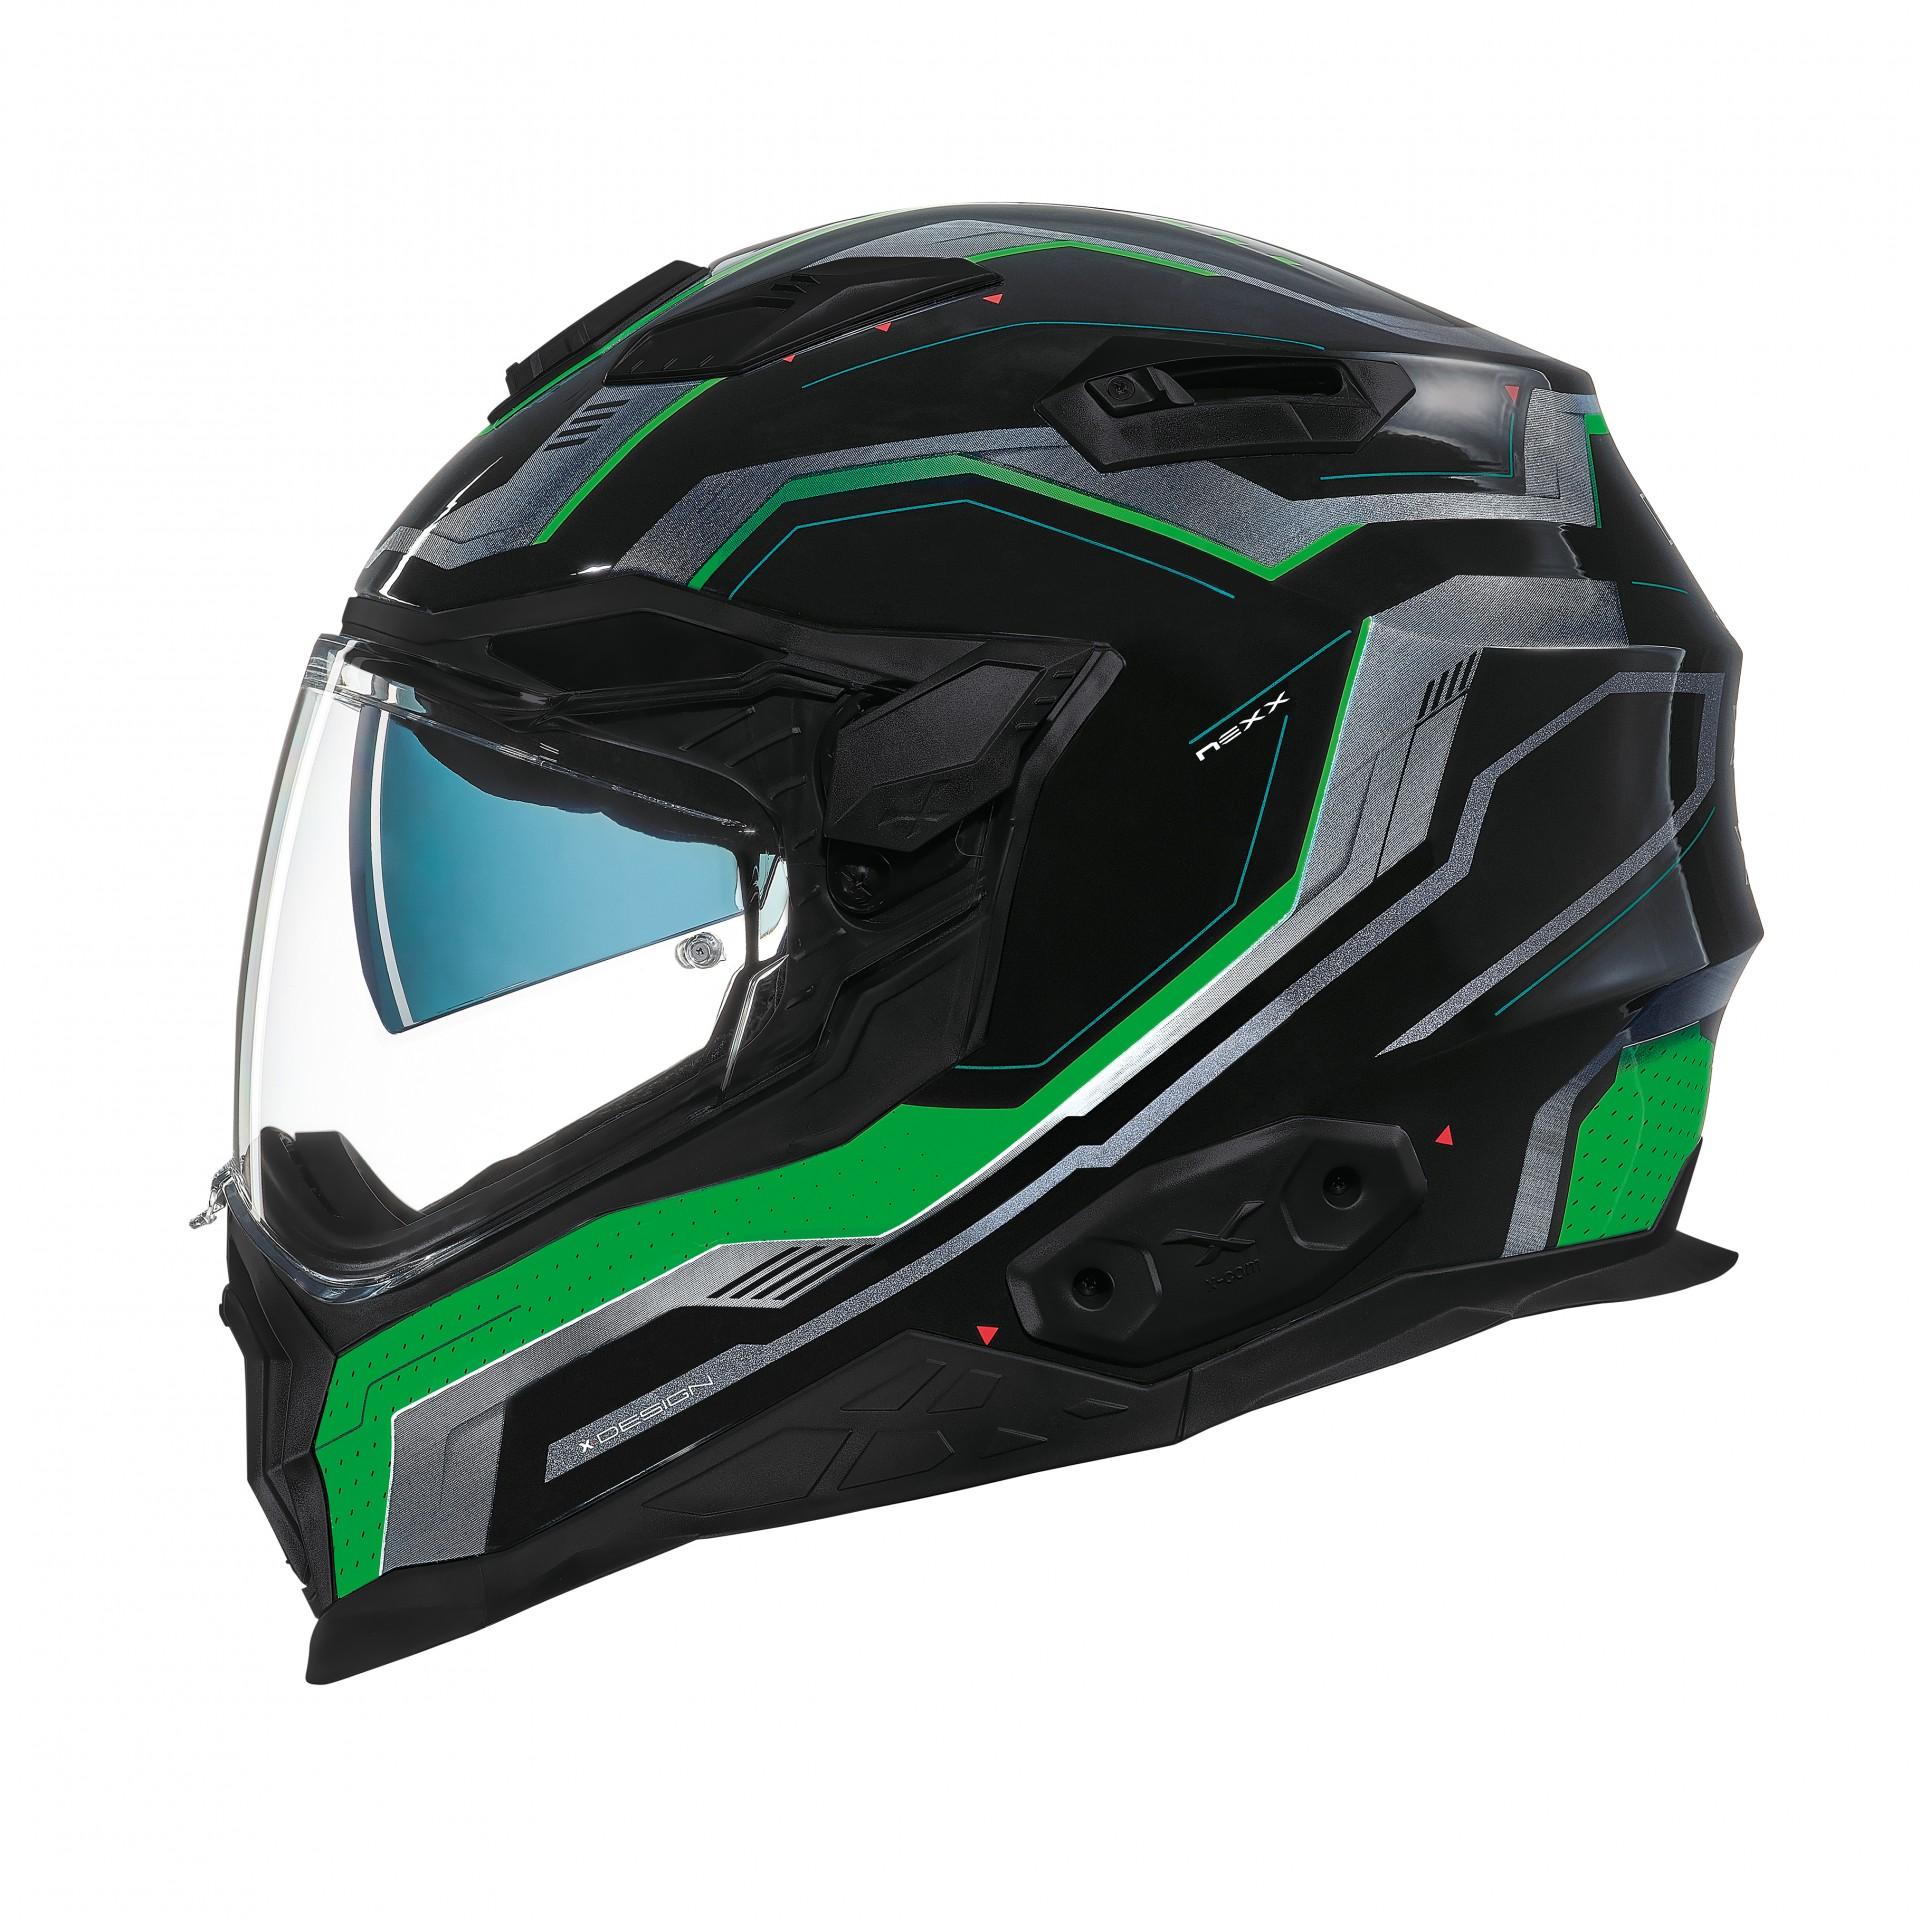 Capacete Nexx X.WST-2 Supercell Preto/Verde